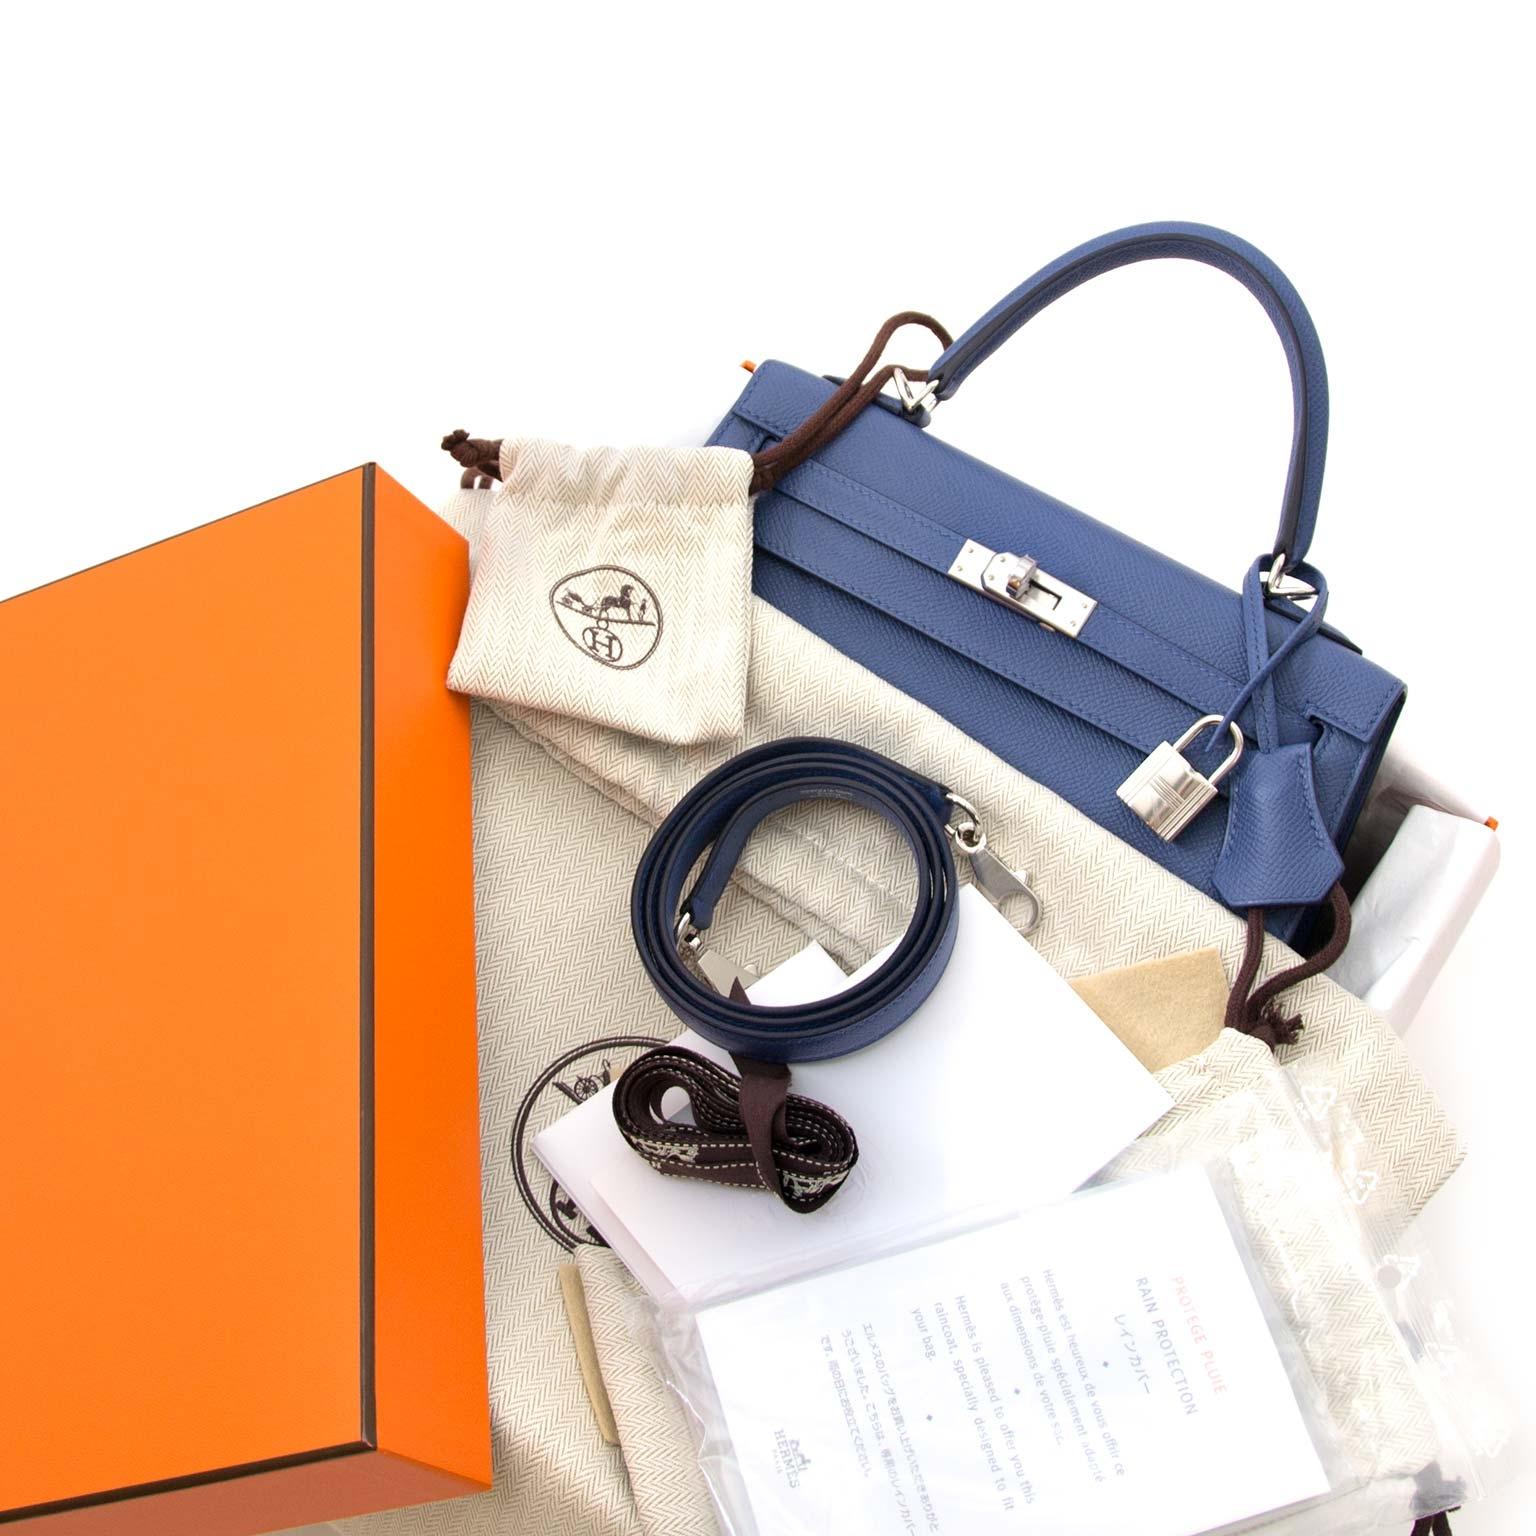 koop al uw hermes kelly en birkin tassen Hermès Kelly Sellier 25 Epsom Bleu Brighton PHW nu bij labellov.com zonder wachtlijst